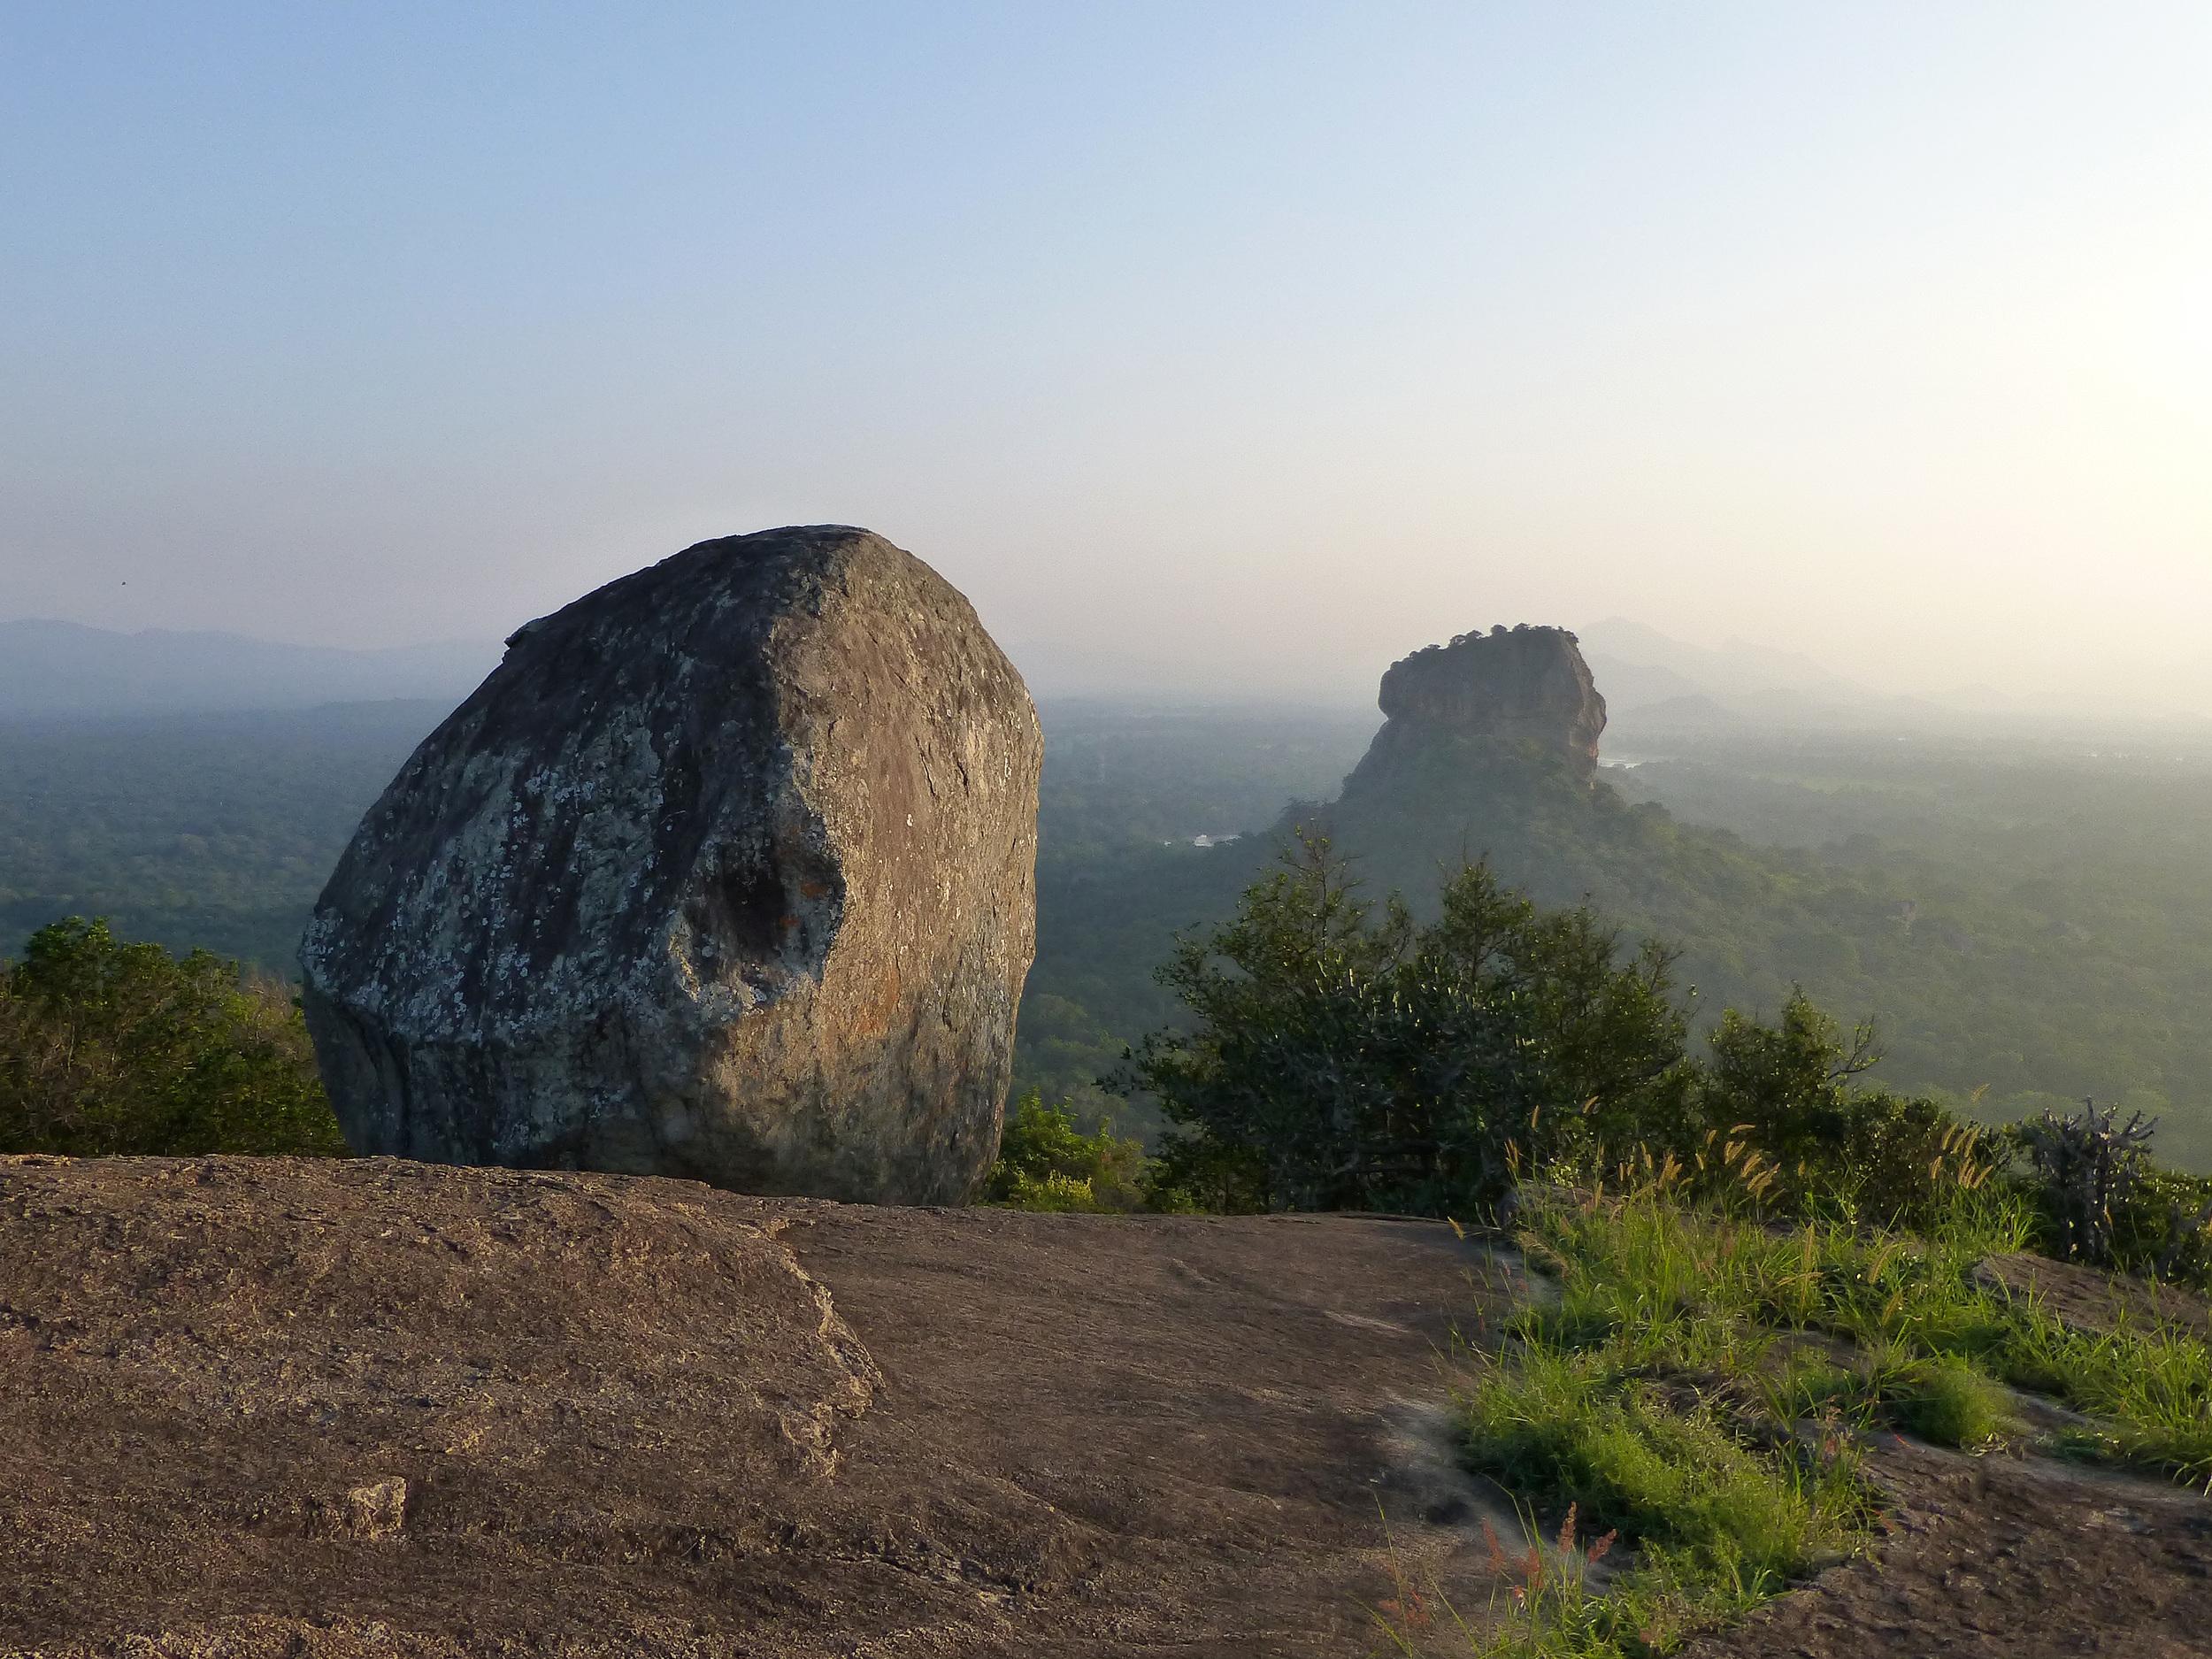 invite-to-paradise-sri-lanka-holiday-honeymoon-sigiriya-rock-fortress-pidurangala-view.jpg